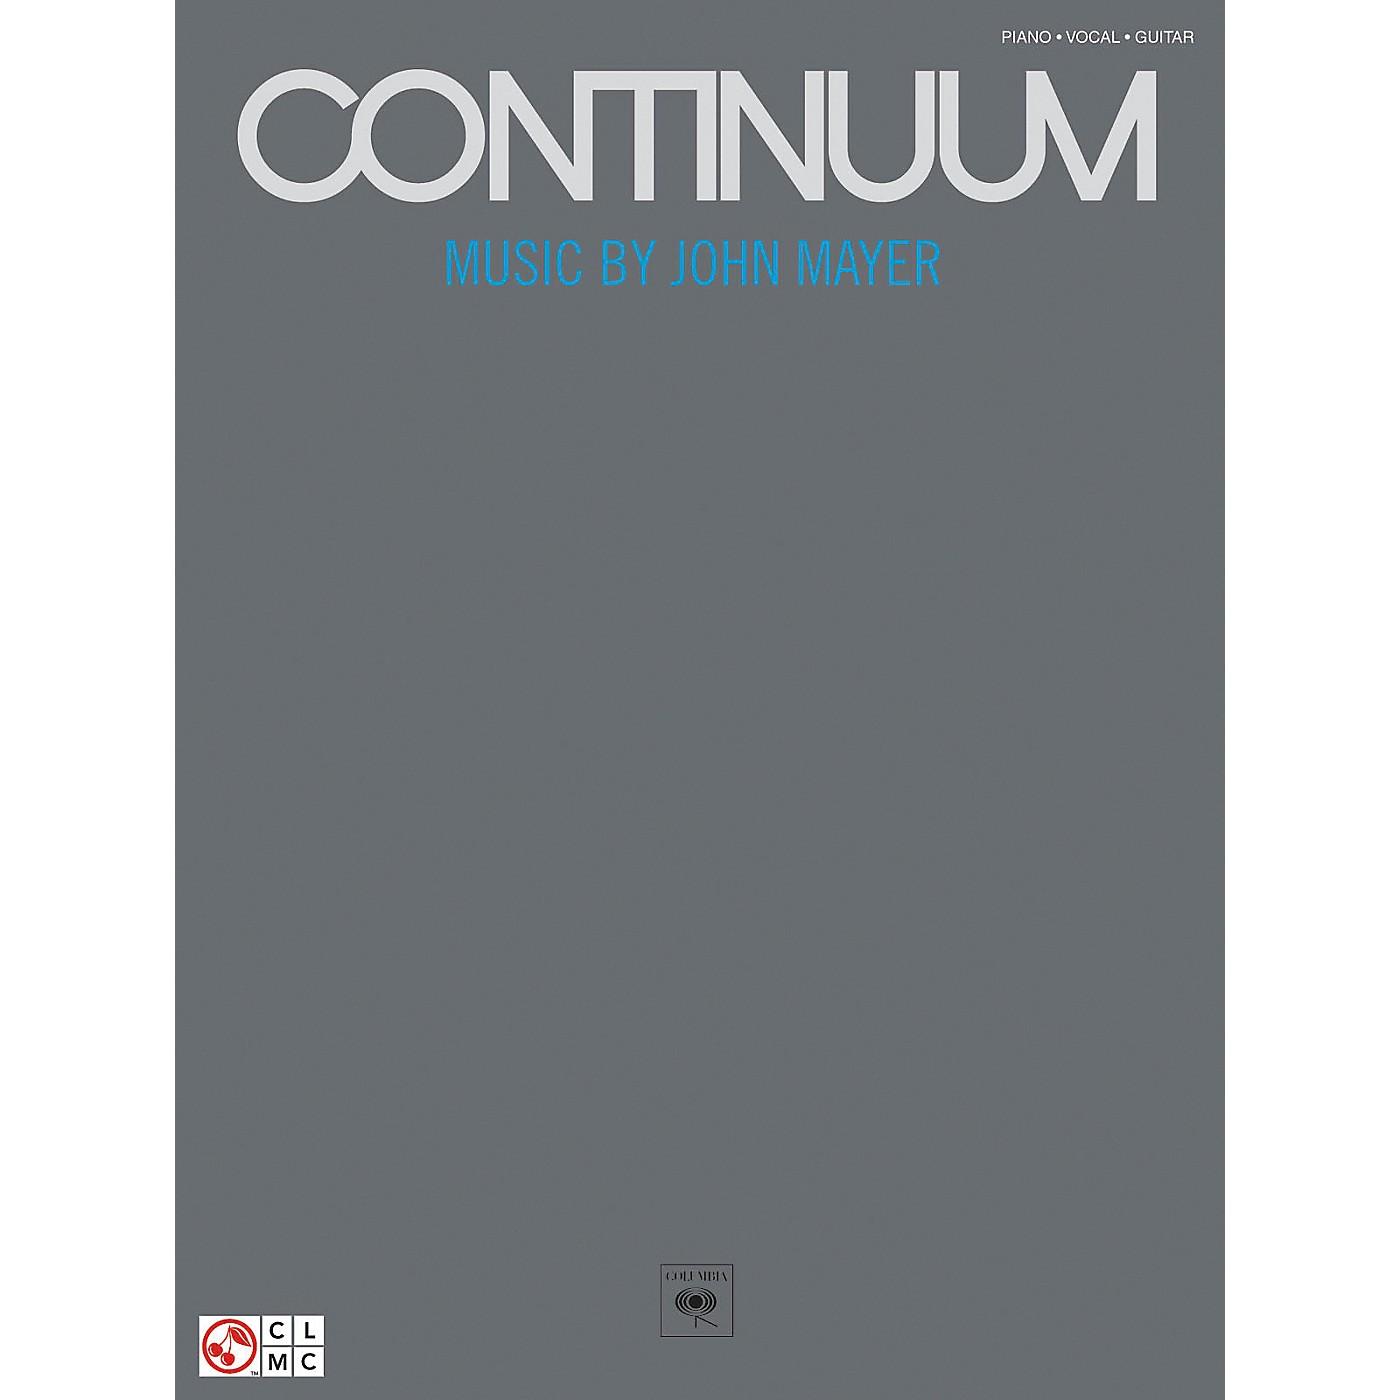 Hal Leonard John Mayer Continuum Piano, Vocal, Guitar Songbook thumbnail